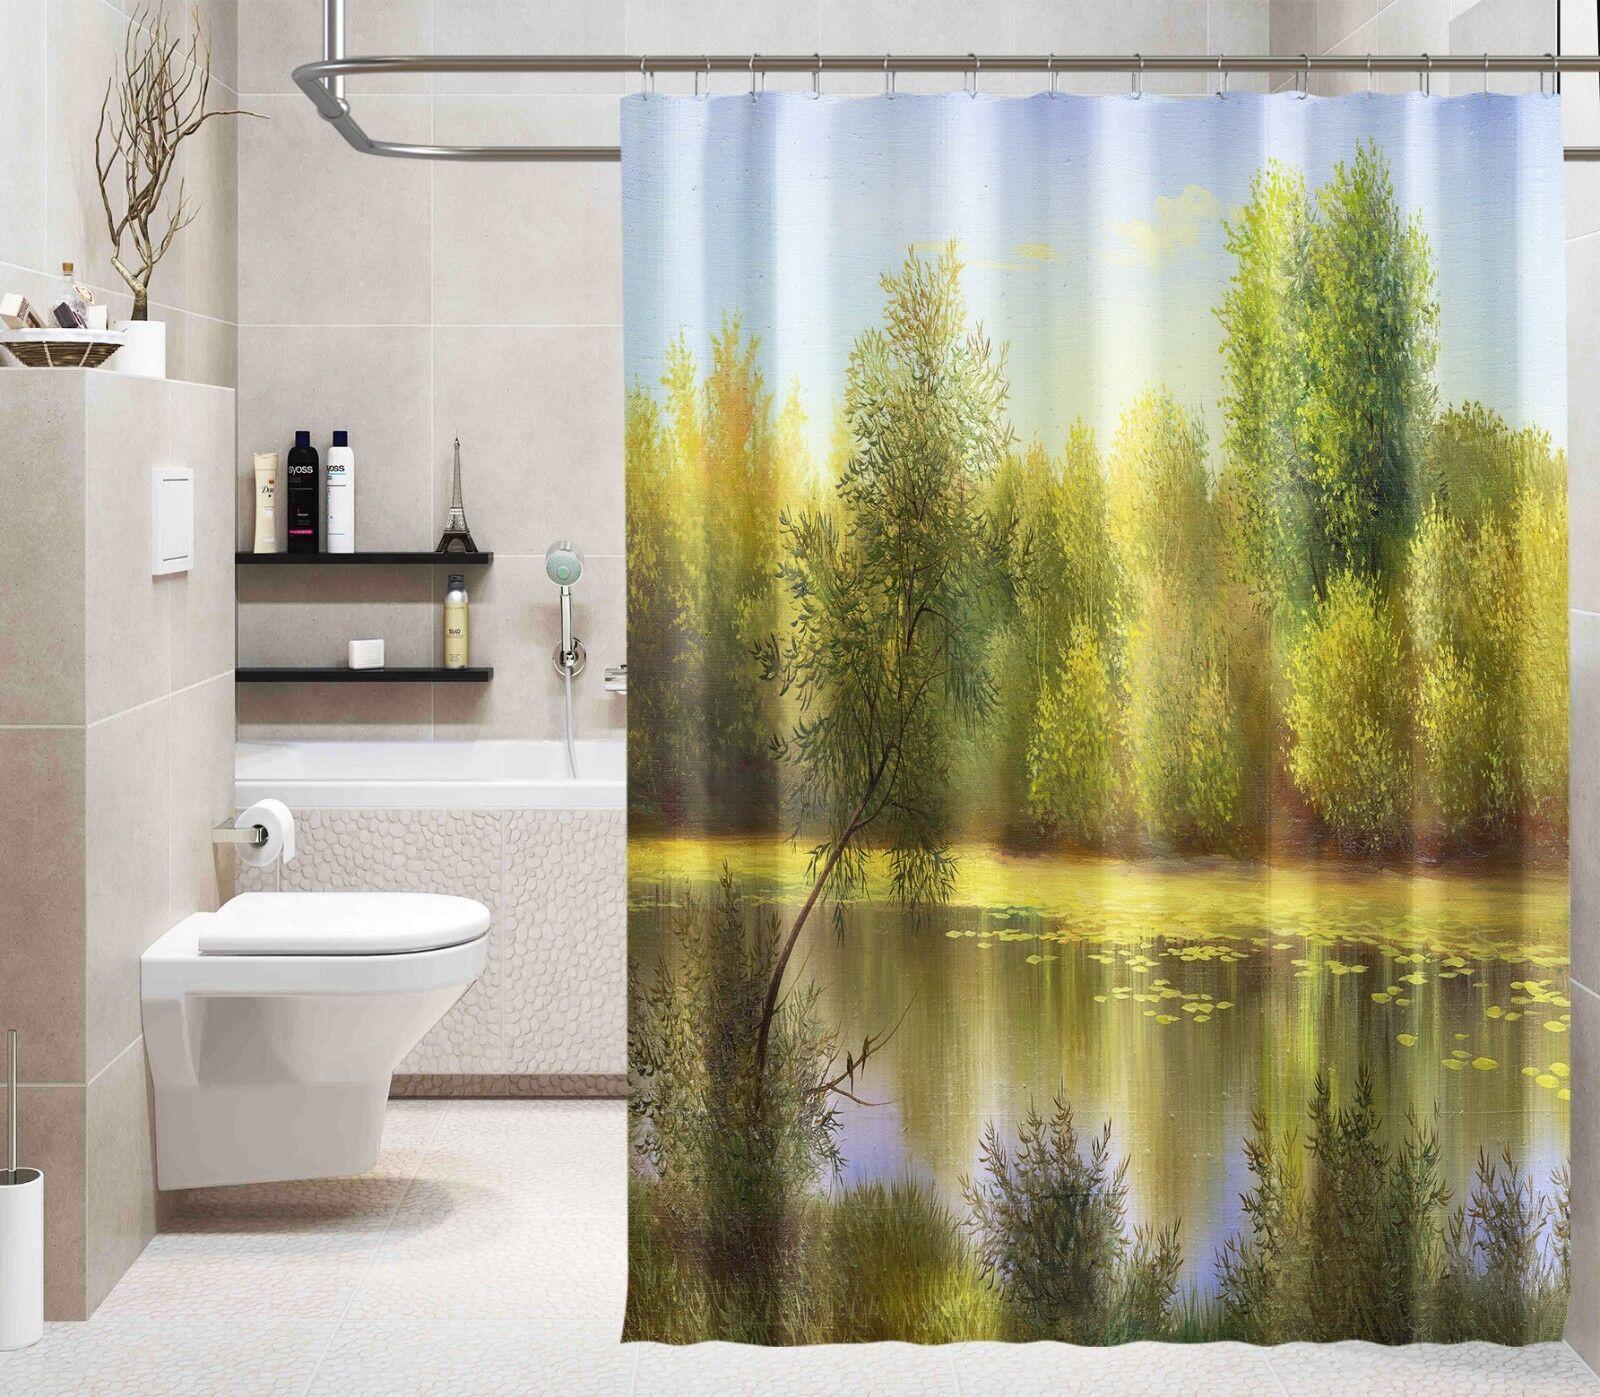 3D Baum Fluss 212 Duschvorhang Wasserdicht Faser Bad Bad Bad Daheim Windows Toilette DE | Elegante Form  8dcff0